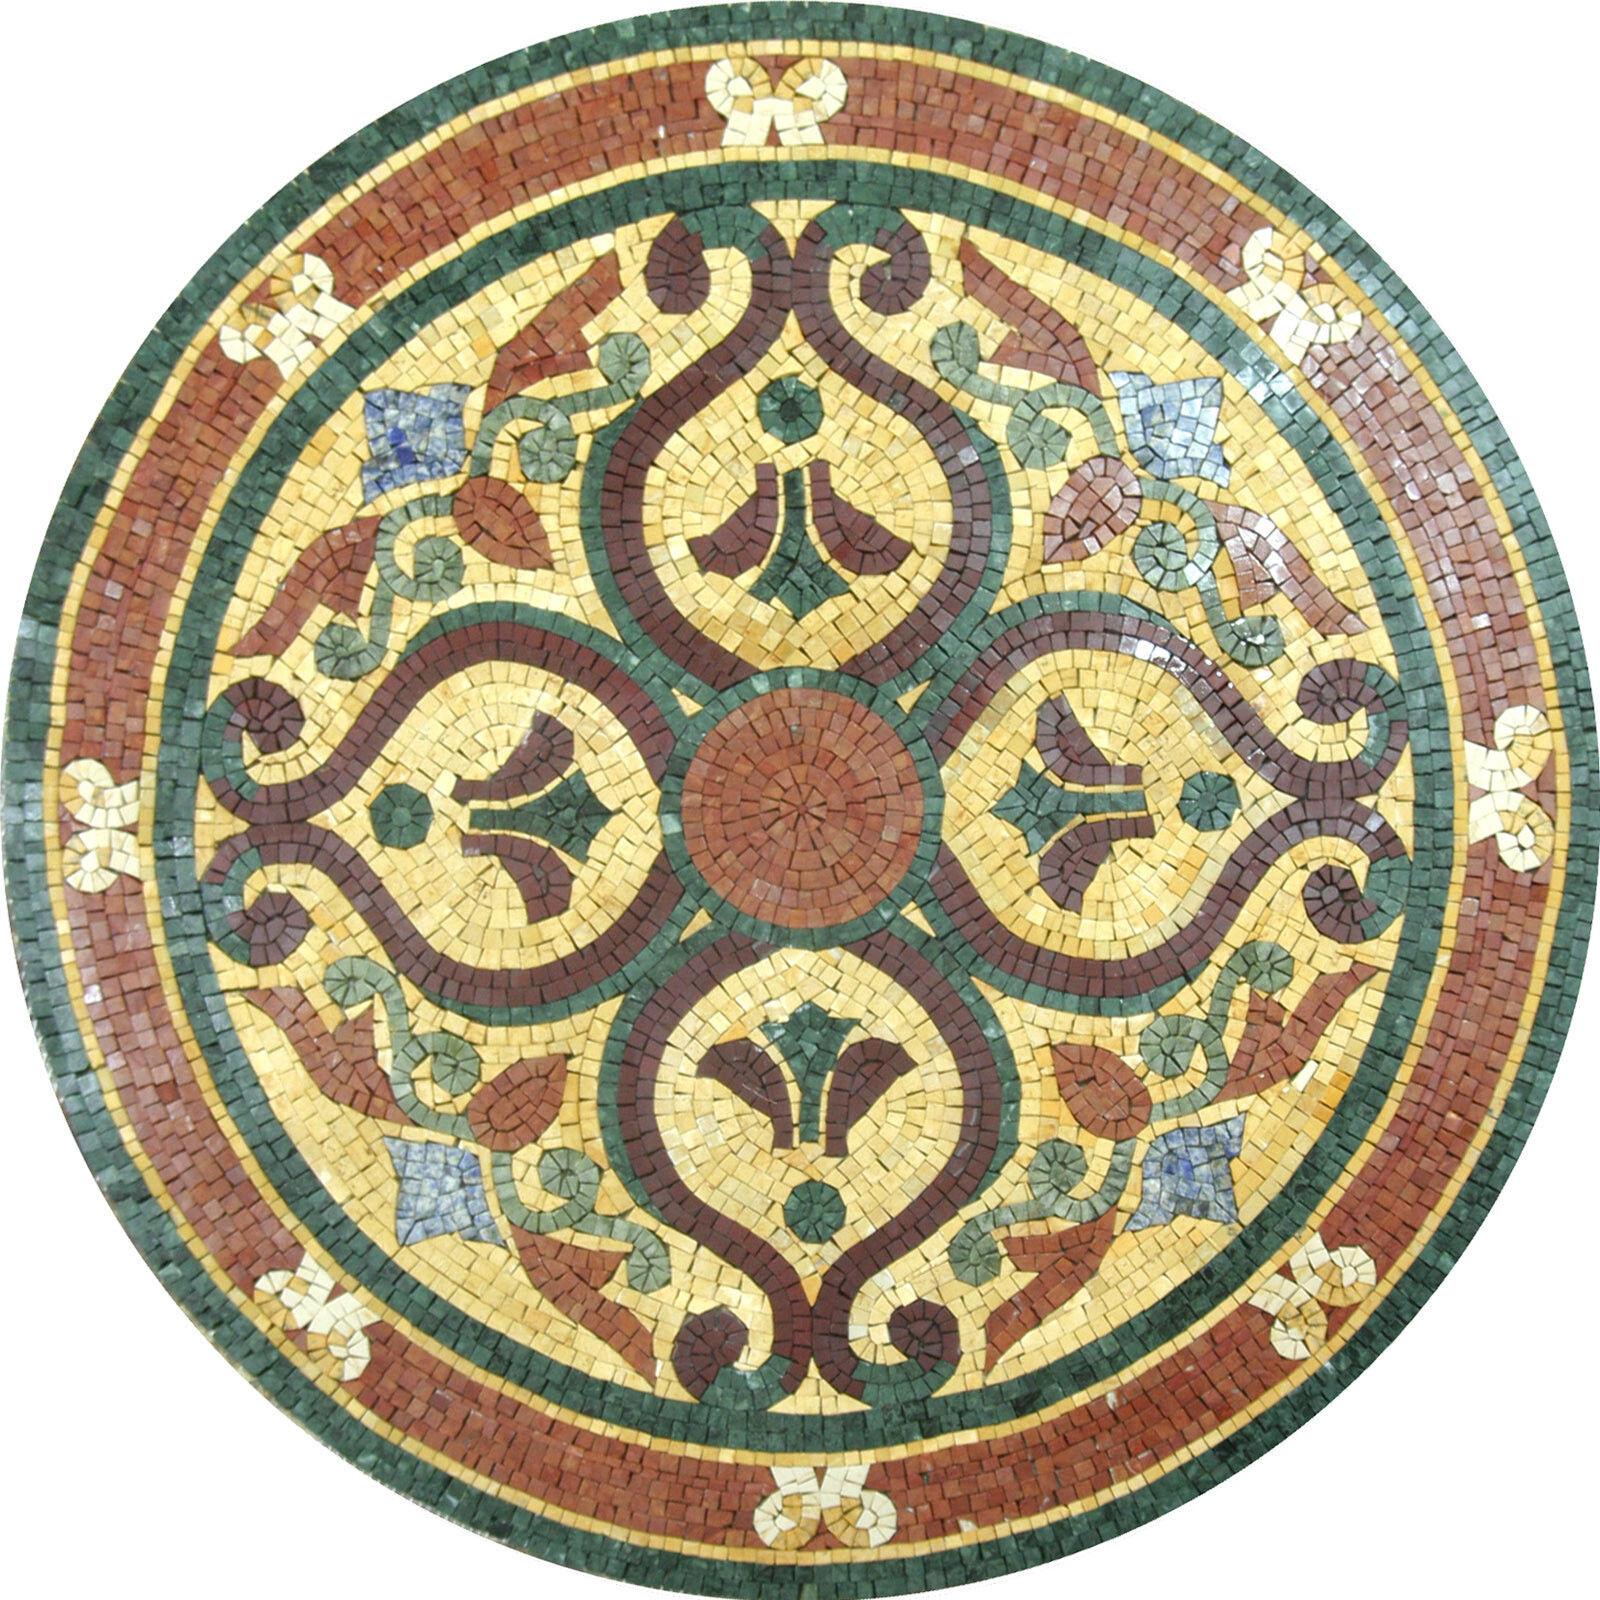 Archaic Motif Decor Round Medallion Tile Marble Mosaic MD1048